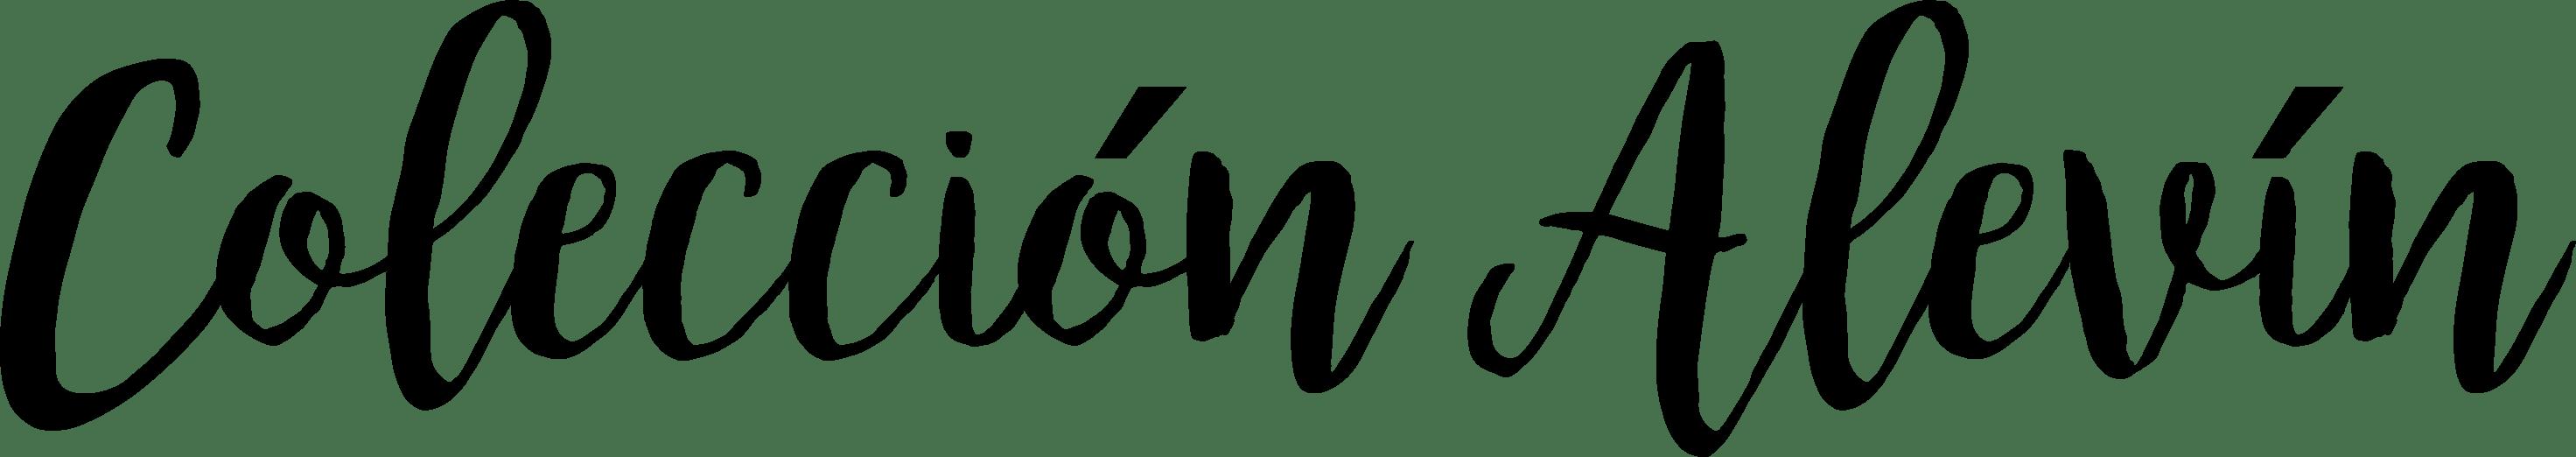 Logo+original+coleccion+alevi-min